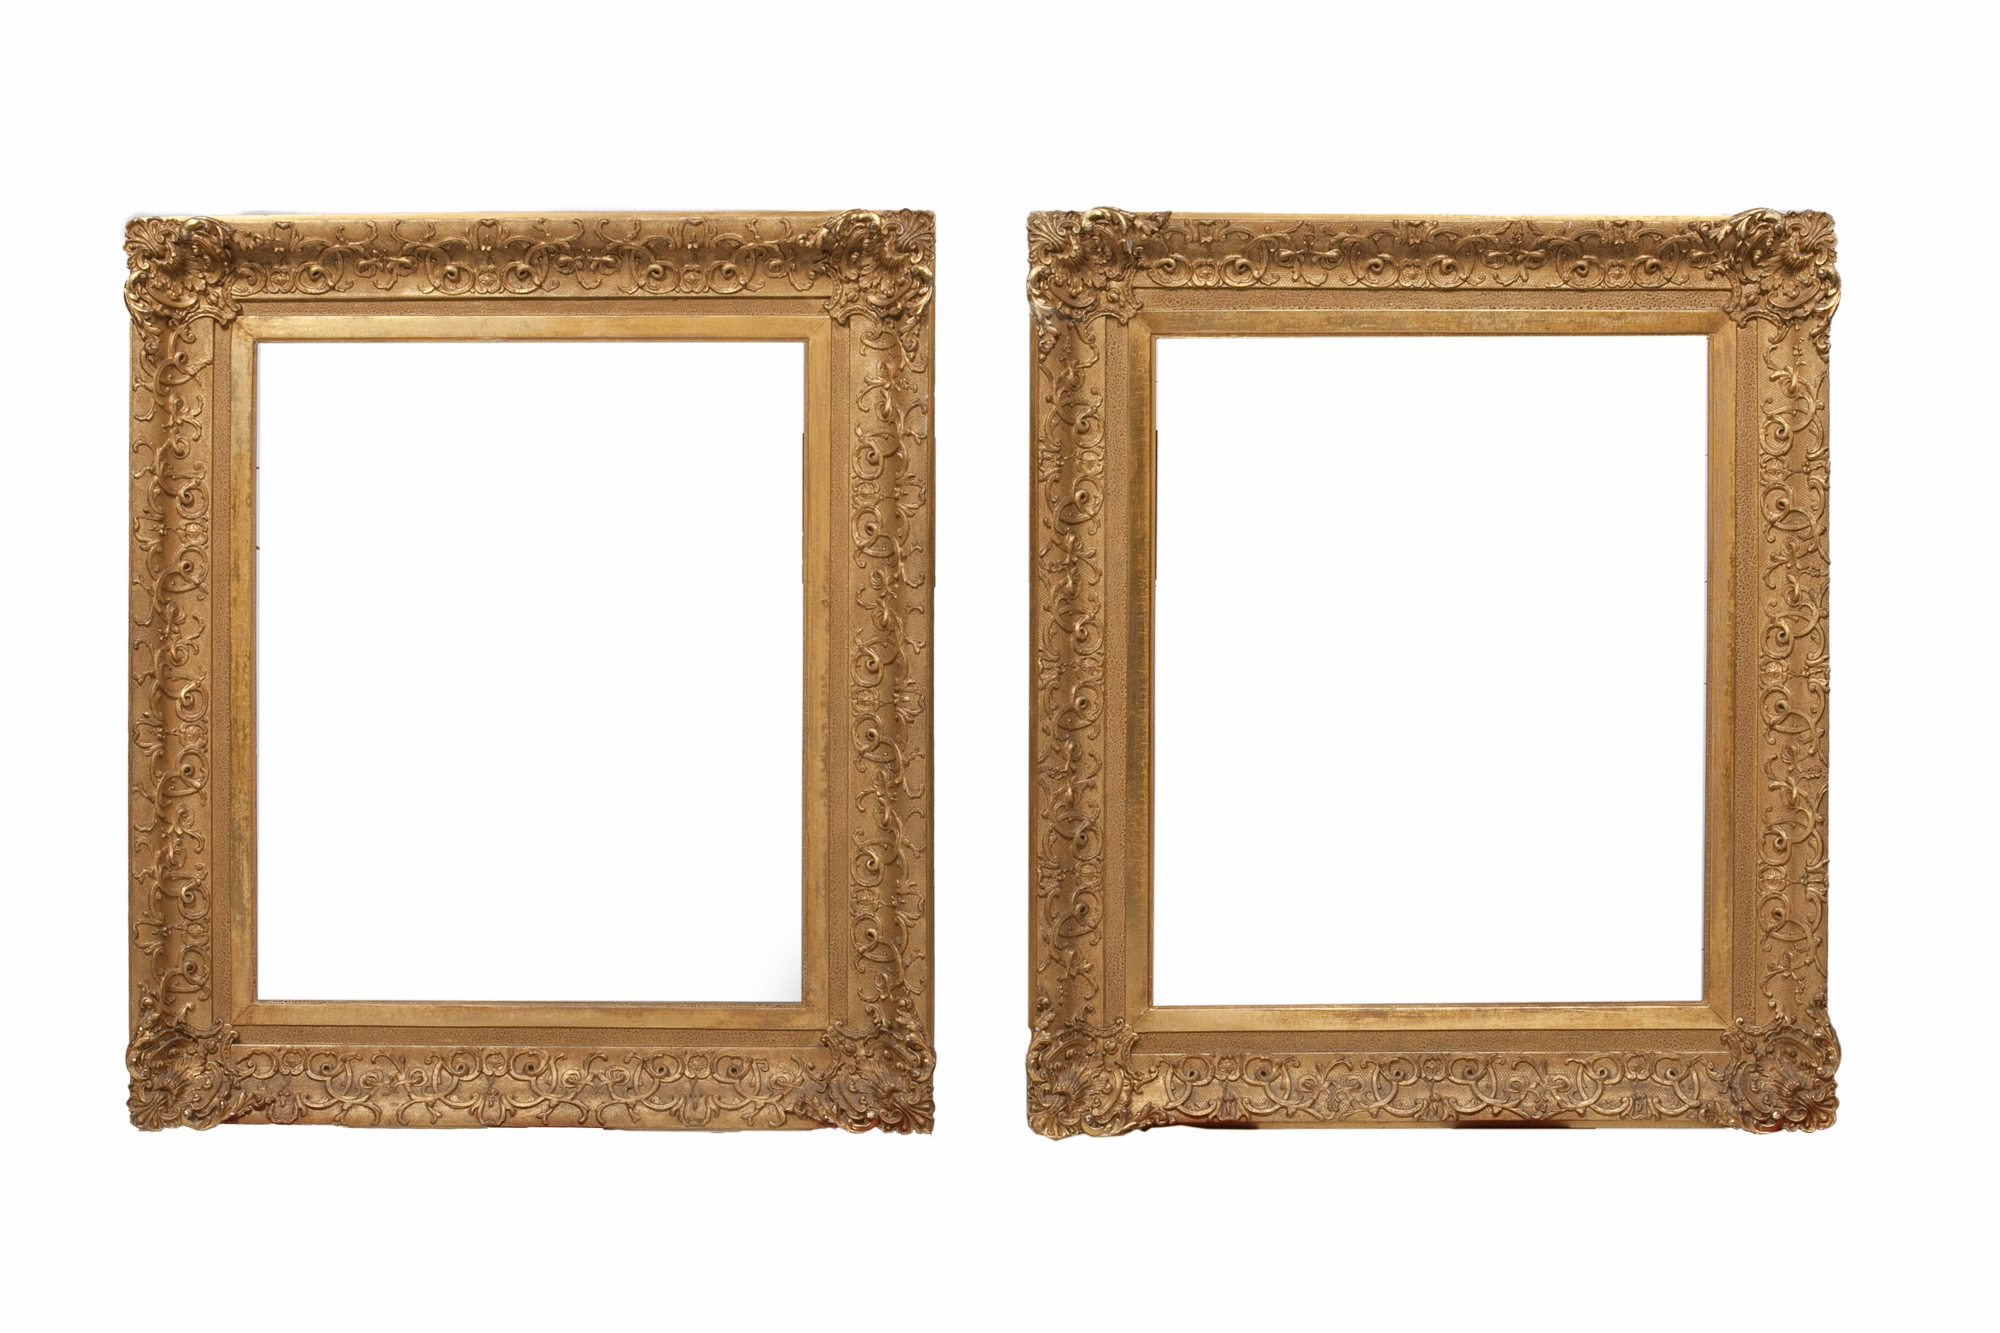 9085 - Early 19th Century Pair of Irish Portrait Frames - O\'Sullivan ...